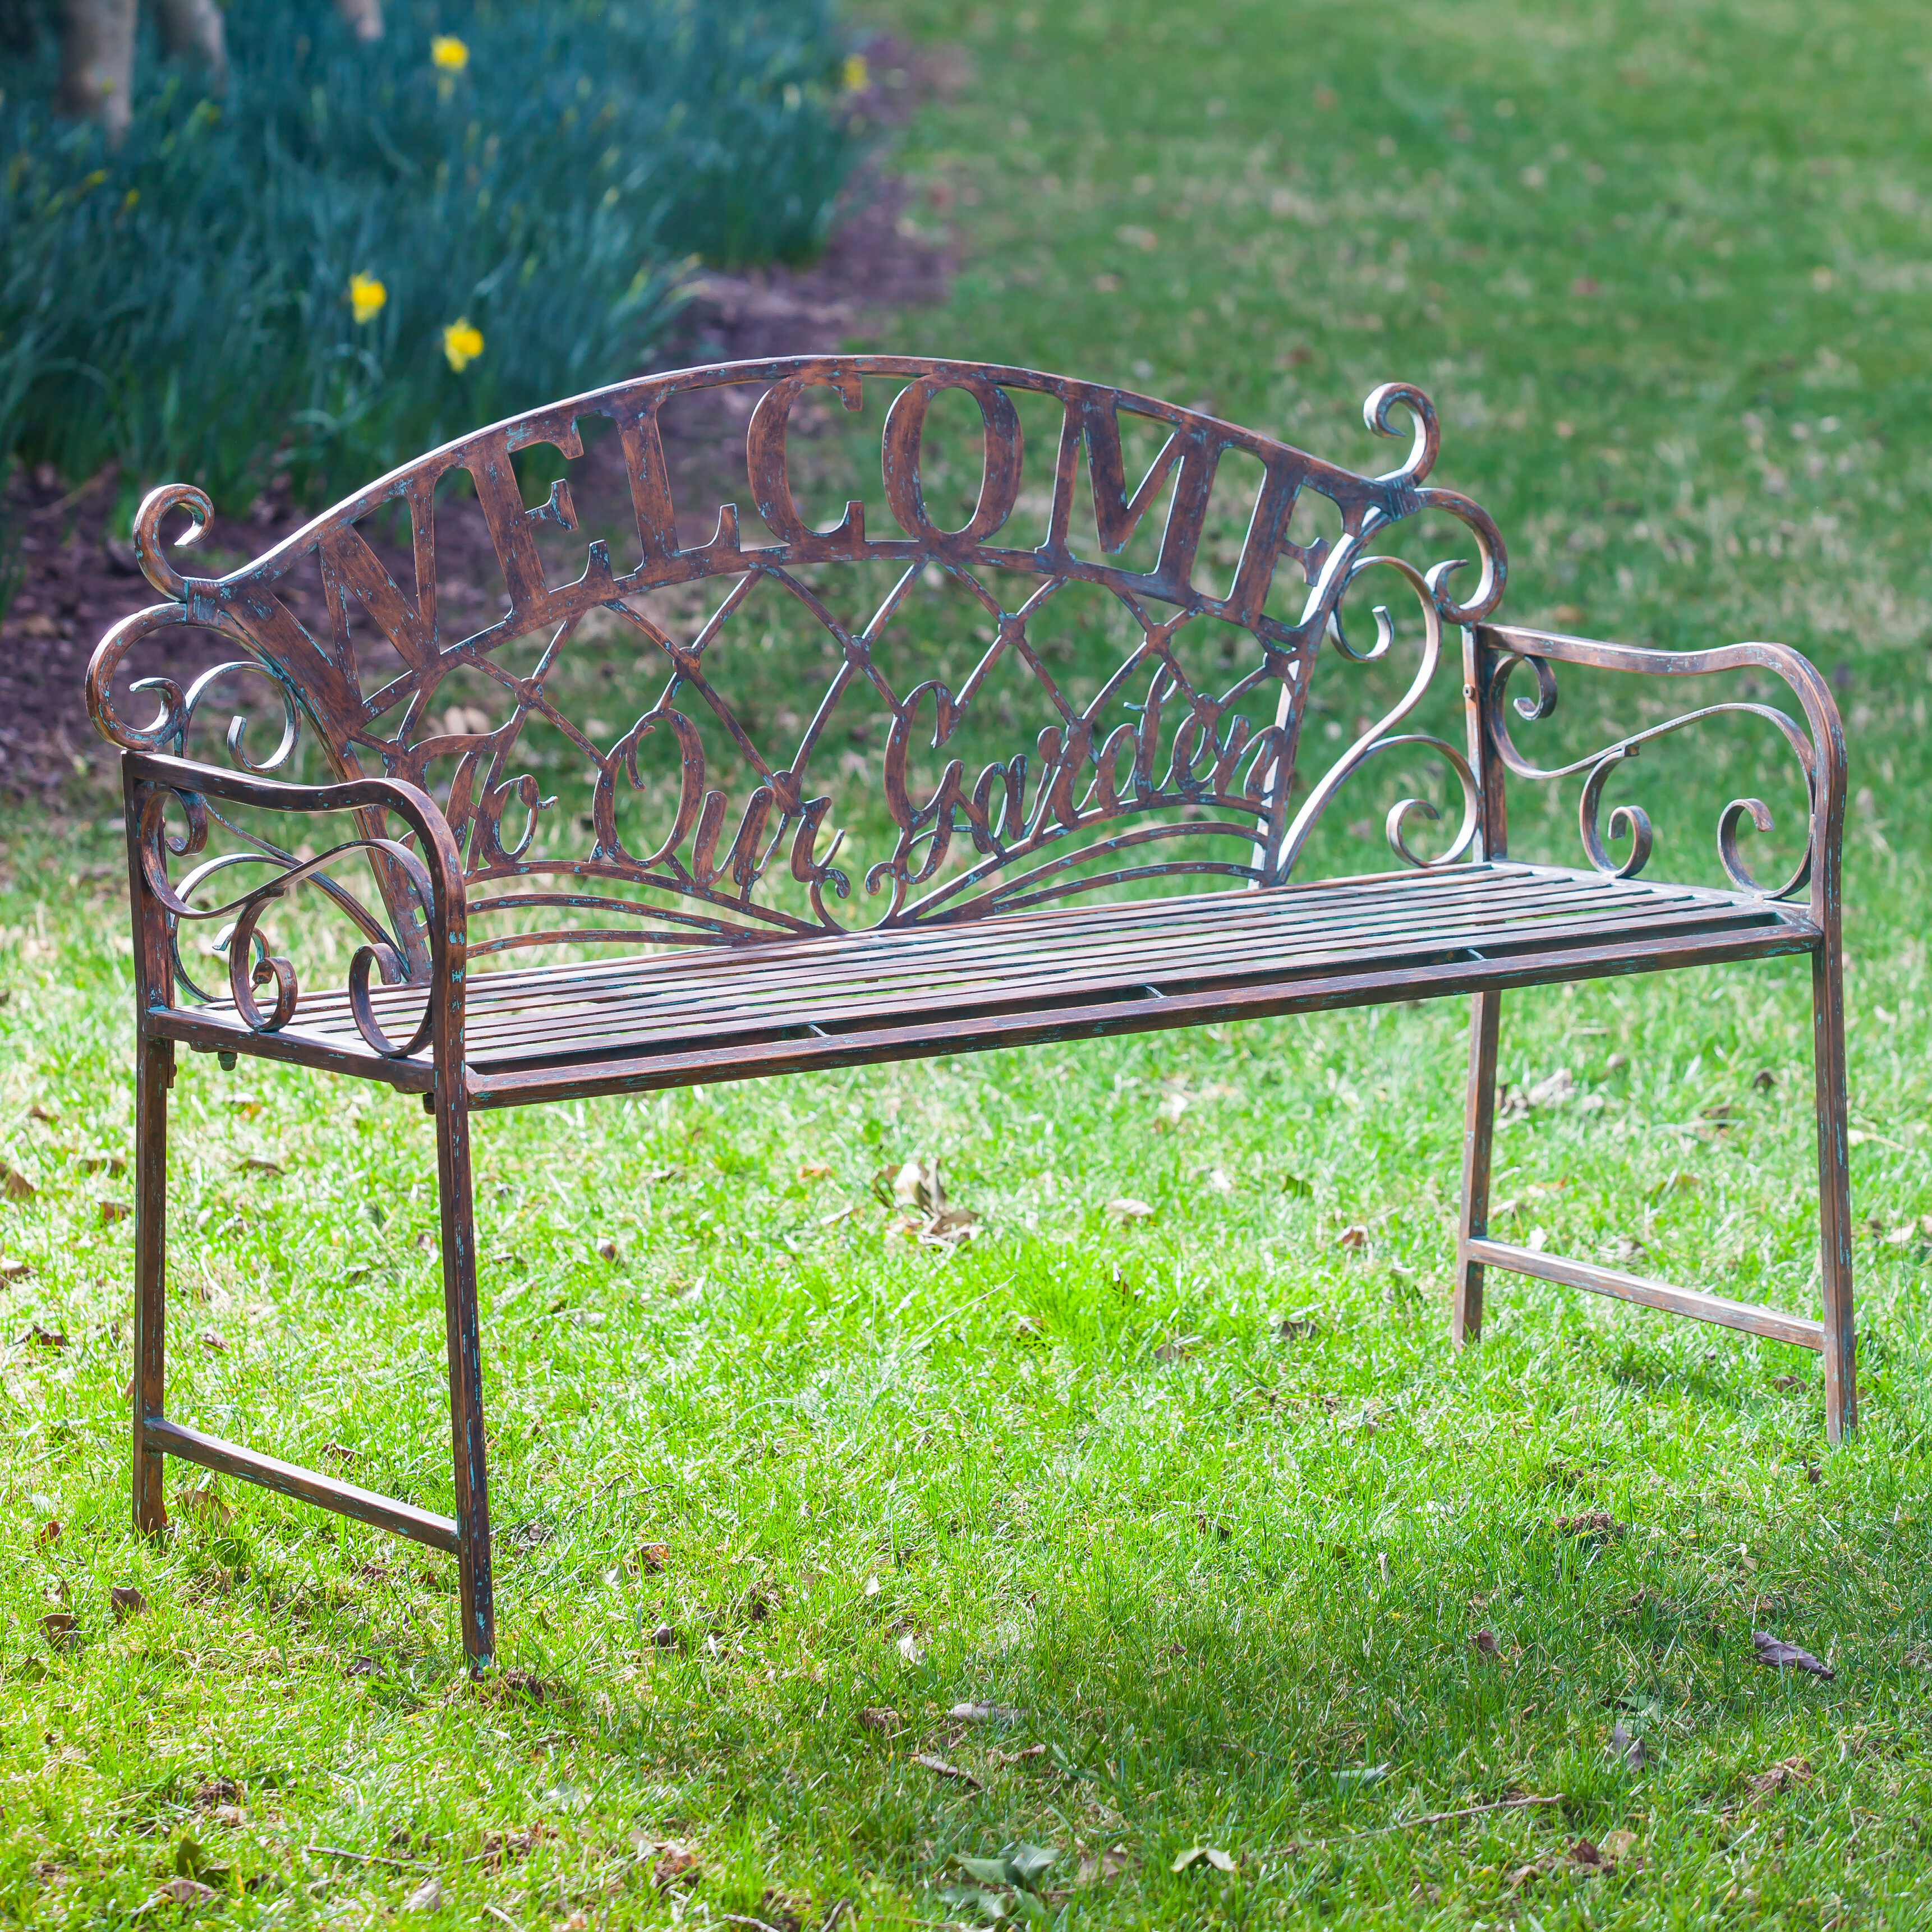 August Grove Hillingdon Welcome To Our Garden Metal Garden Bench